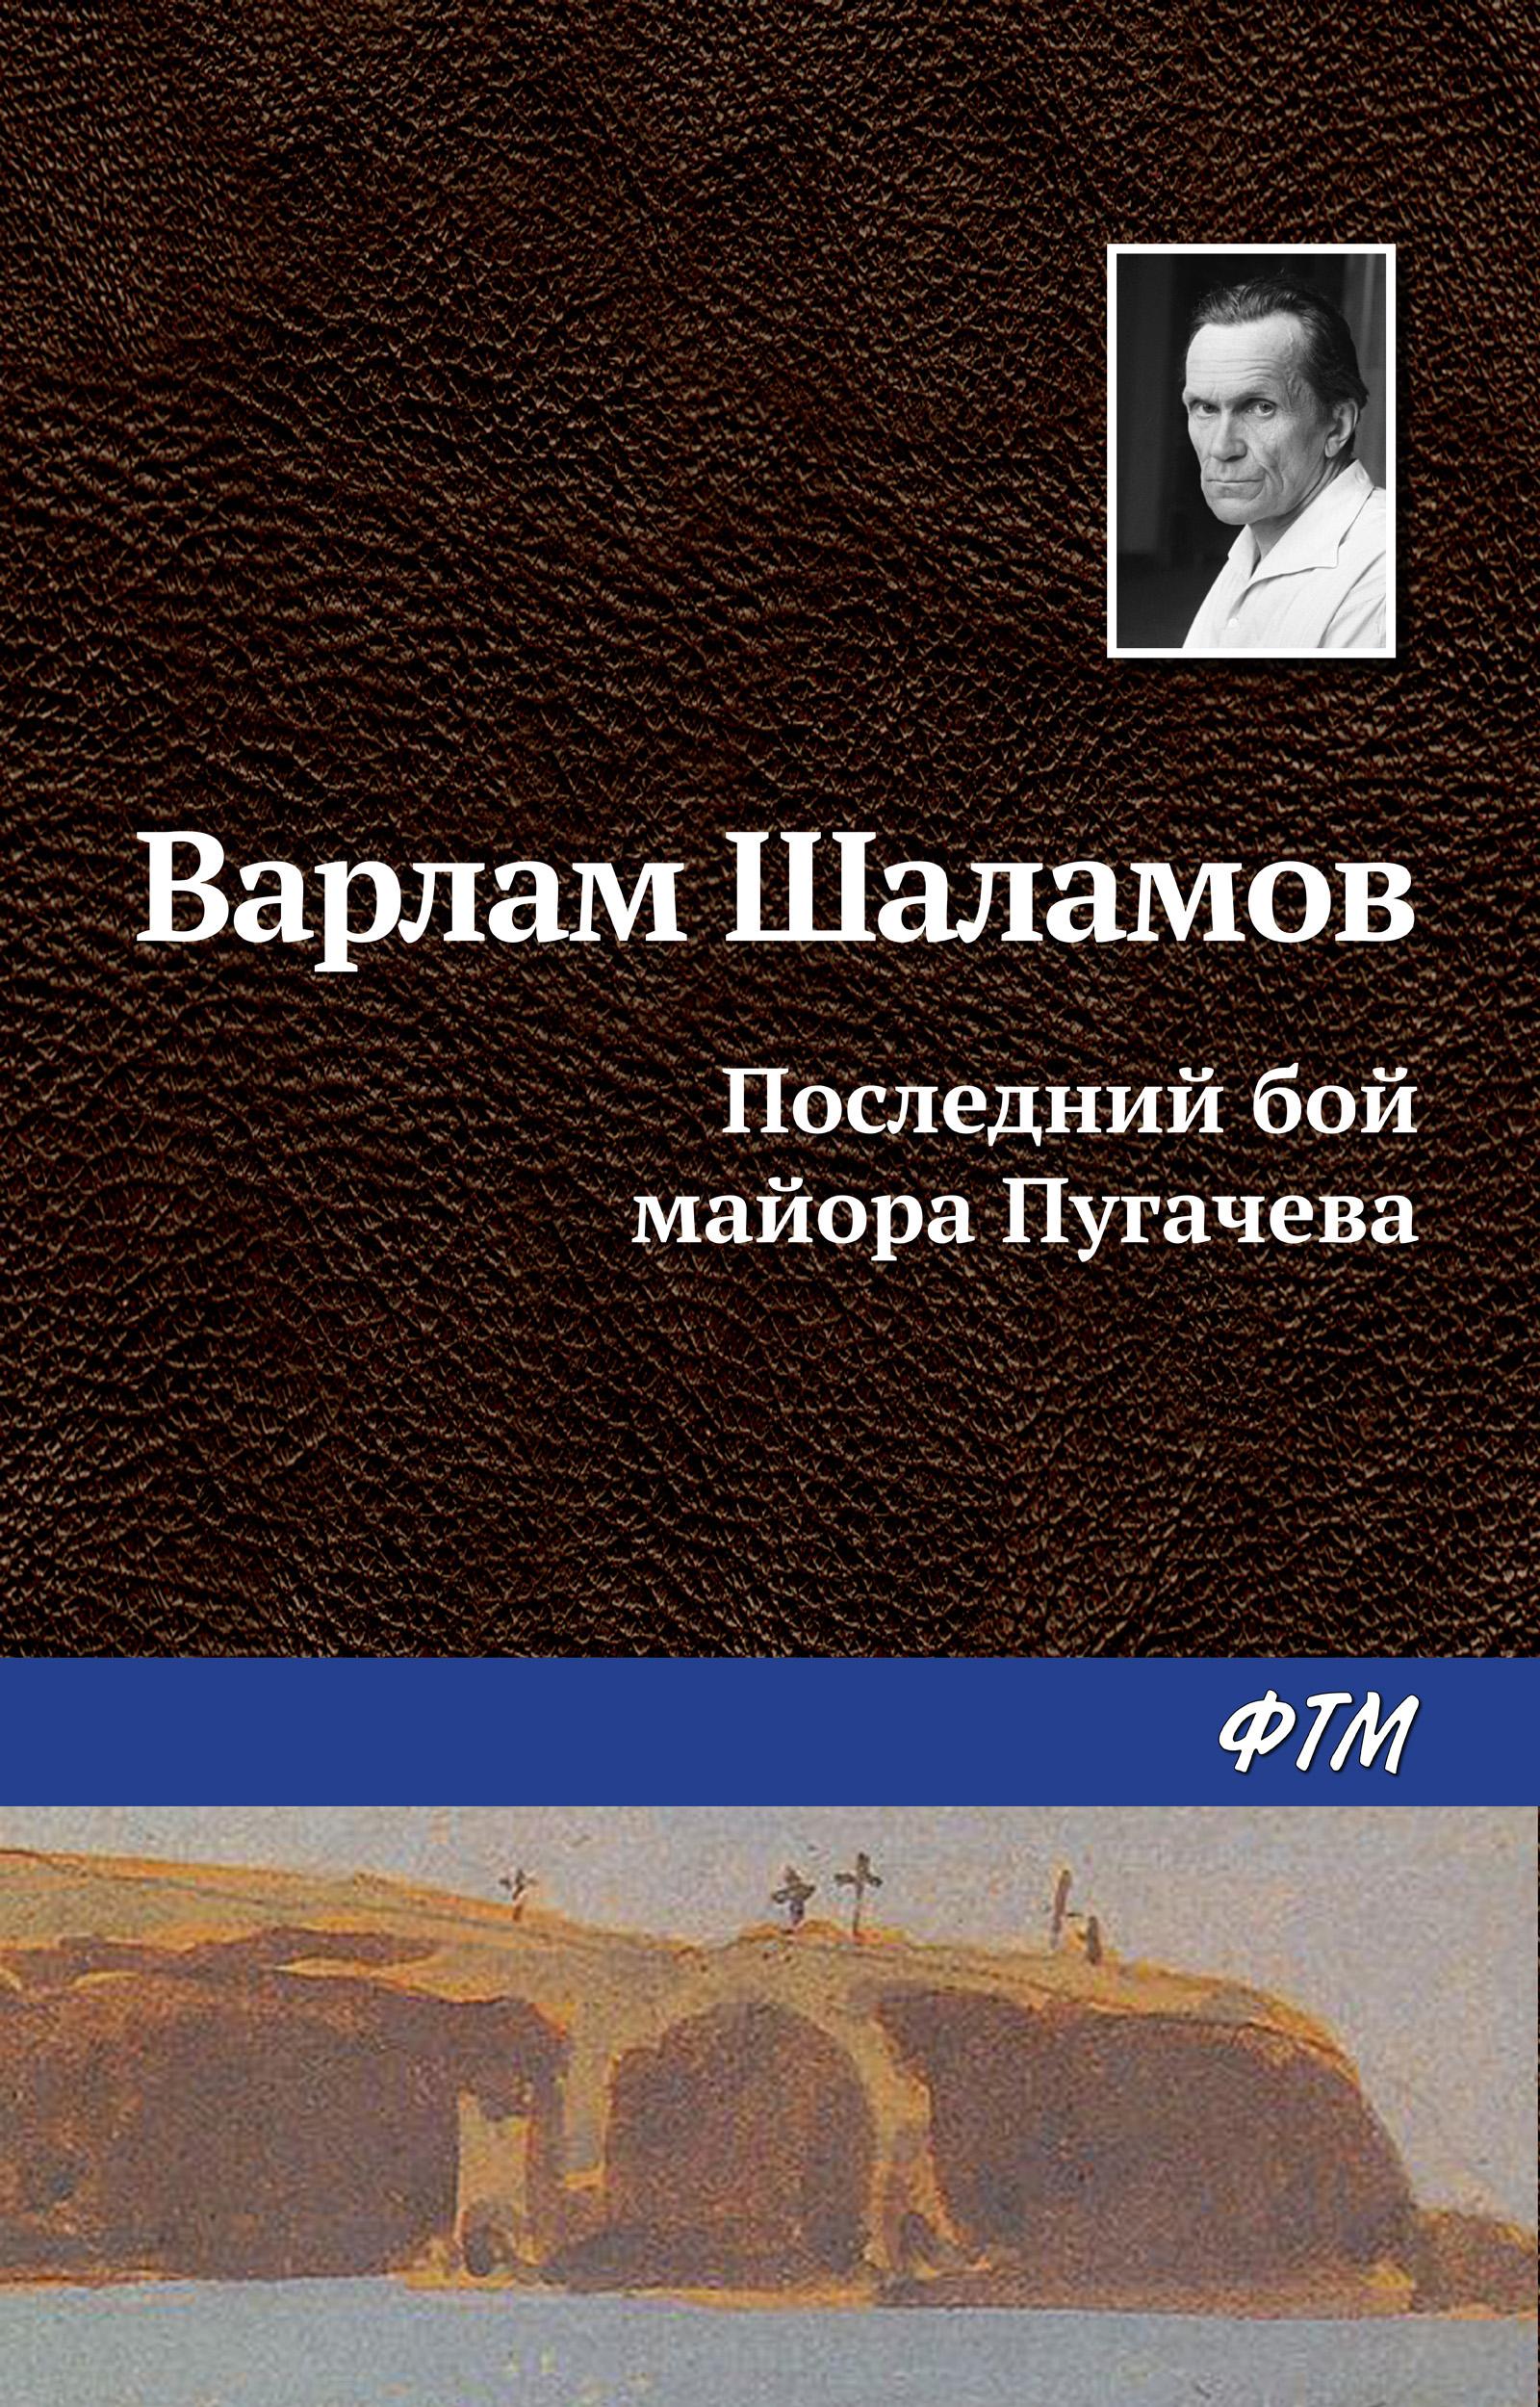 Варлам Шаламов Последний бой майора Пугачева нетаниягу и последний бой йони